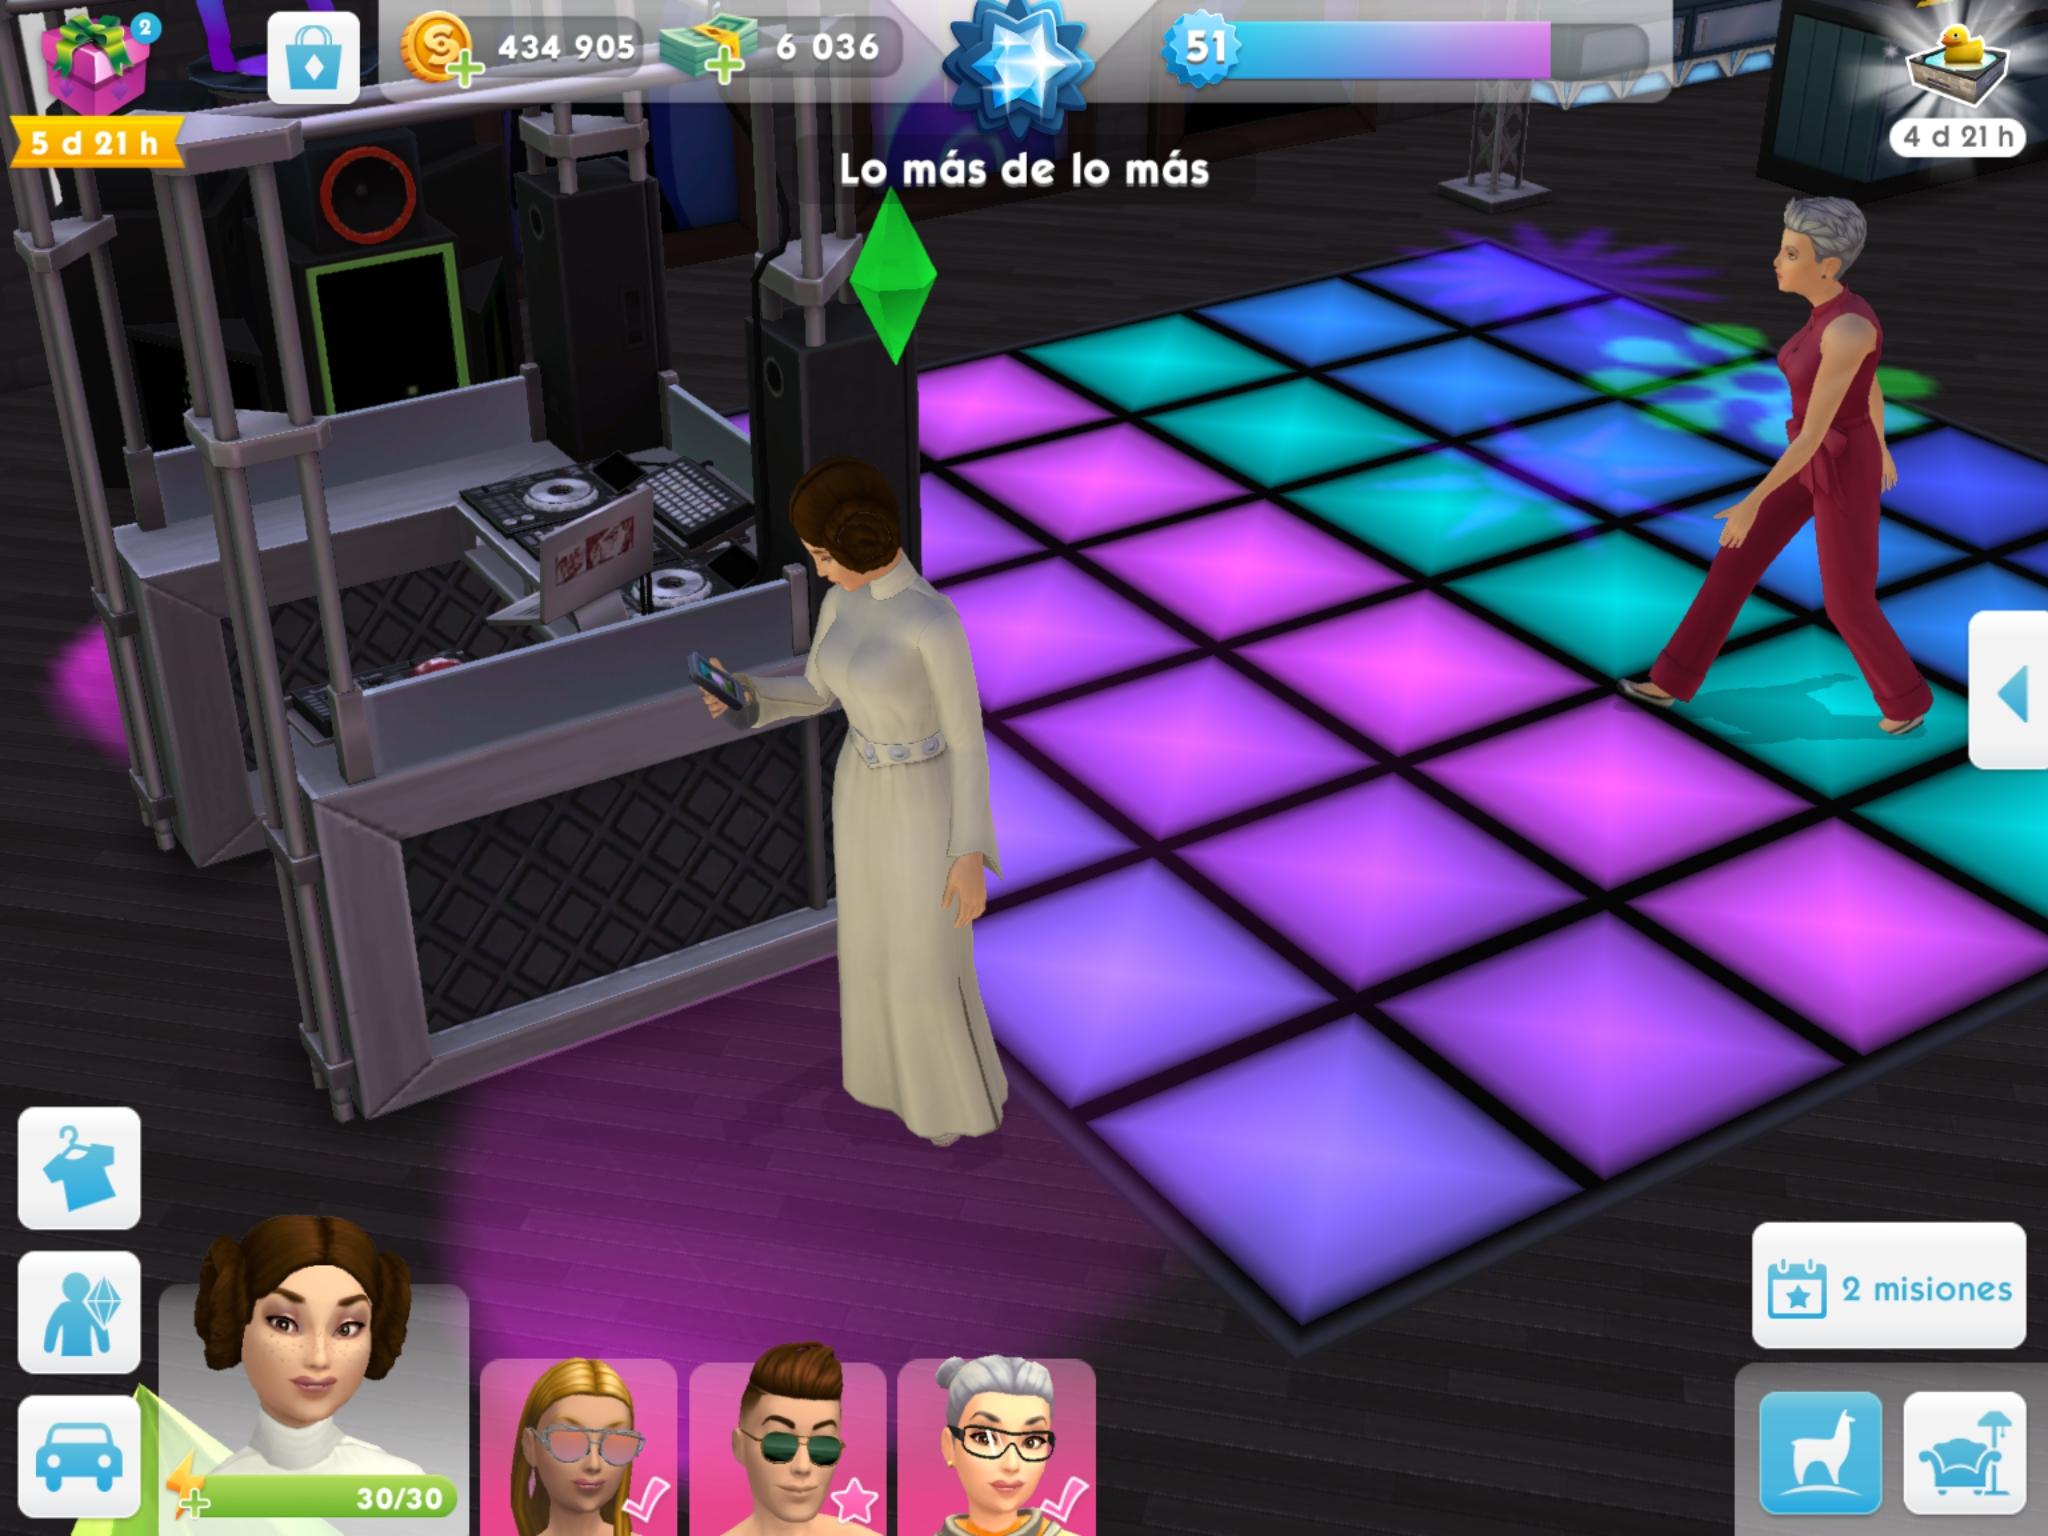 Los Sims_2020-05-05-21-57-14.jpg